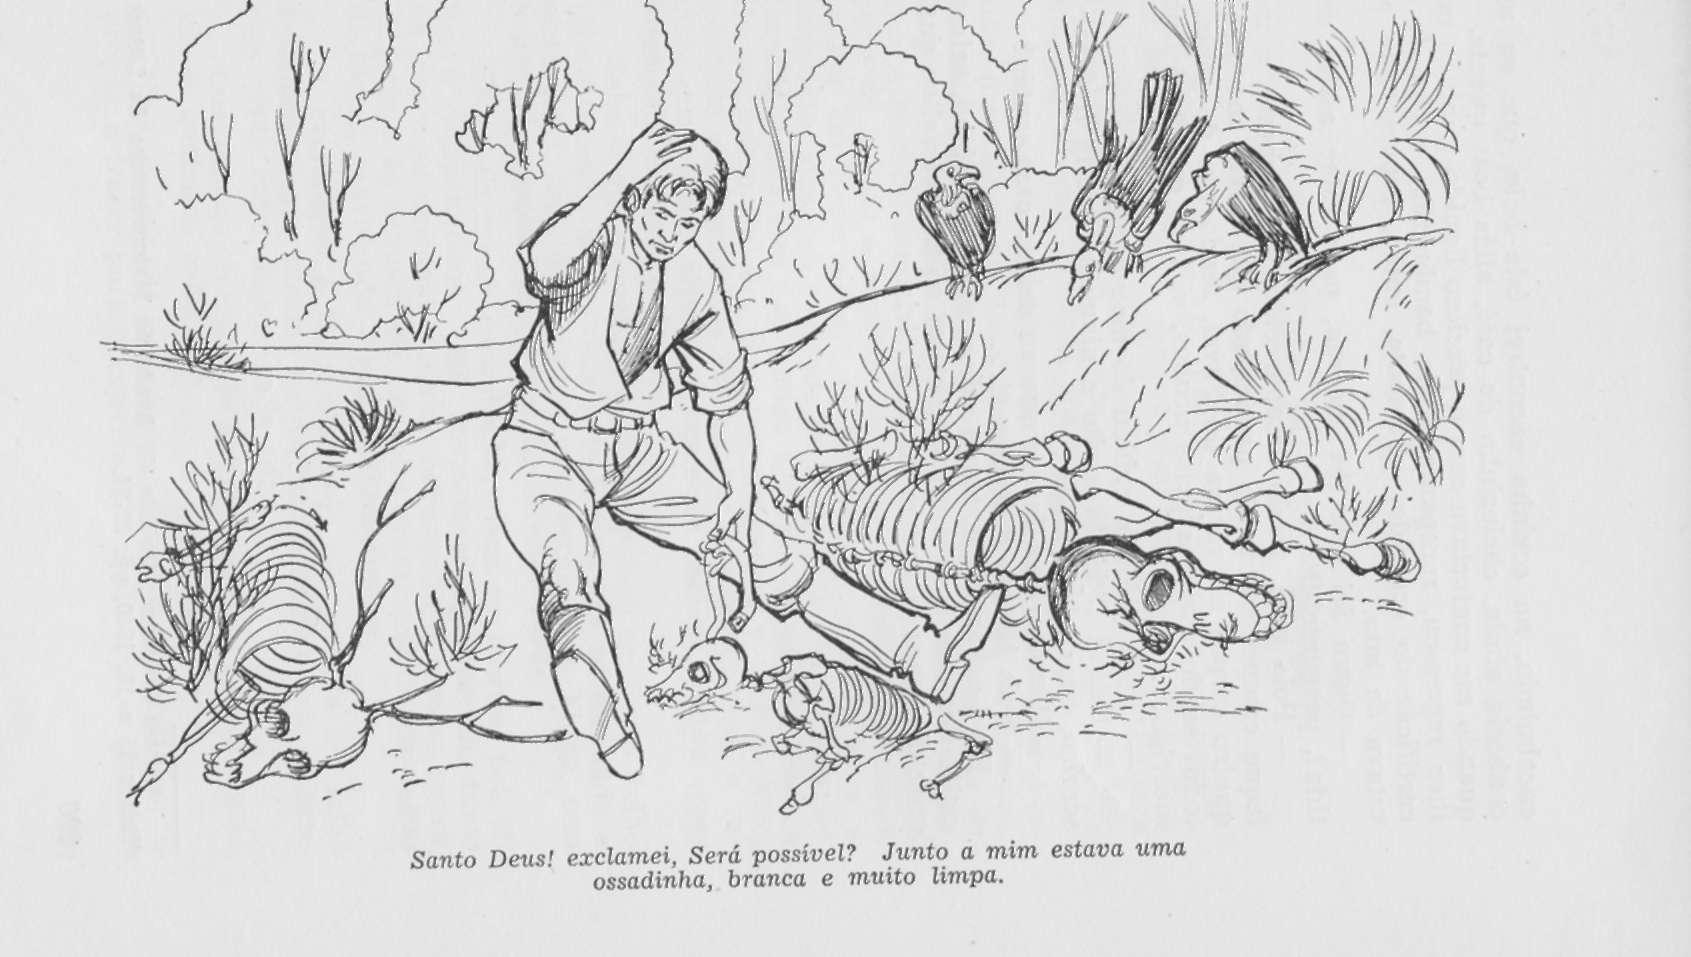 ilustração ossada urubu